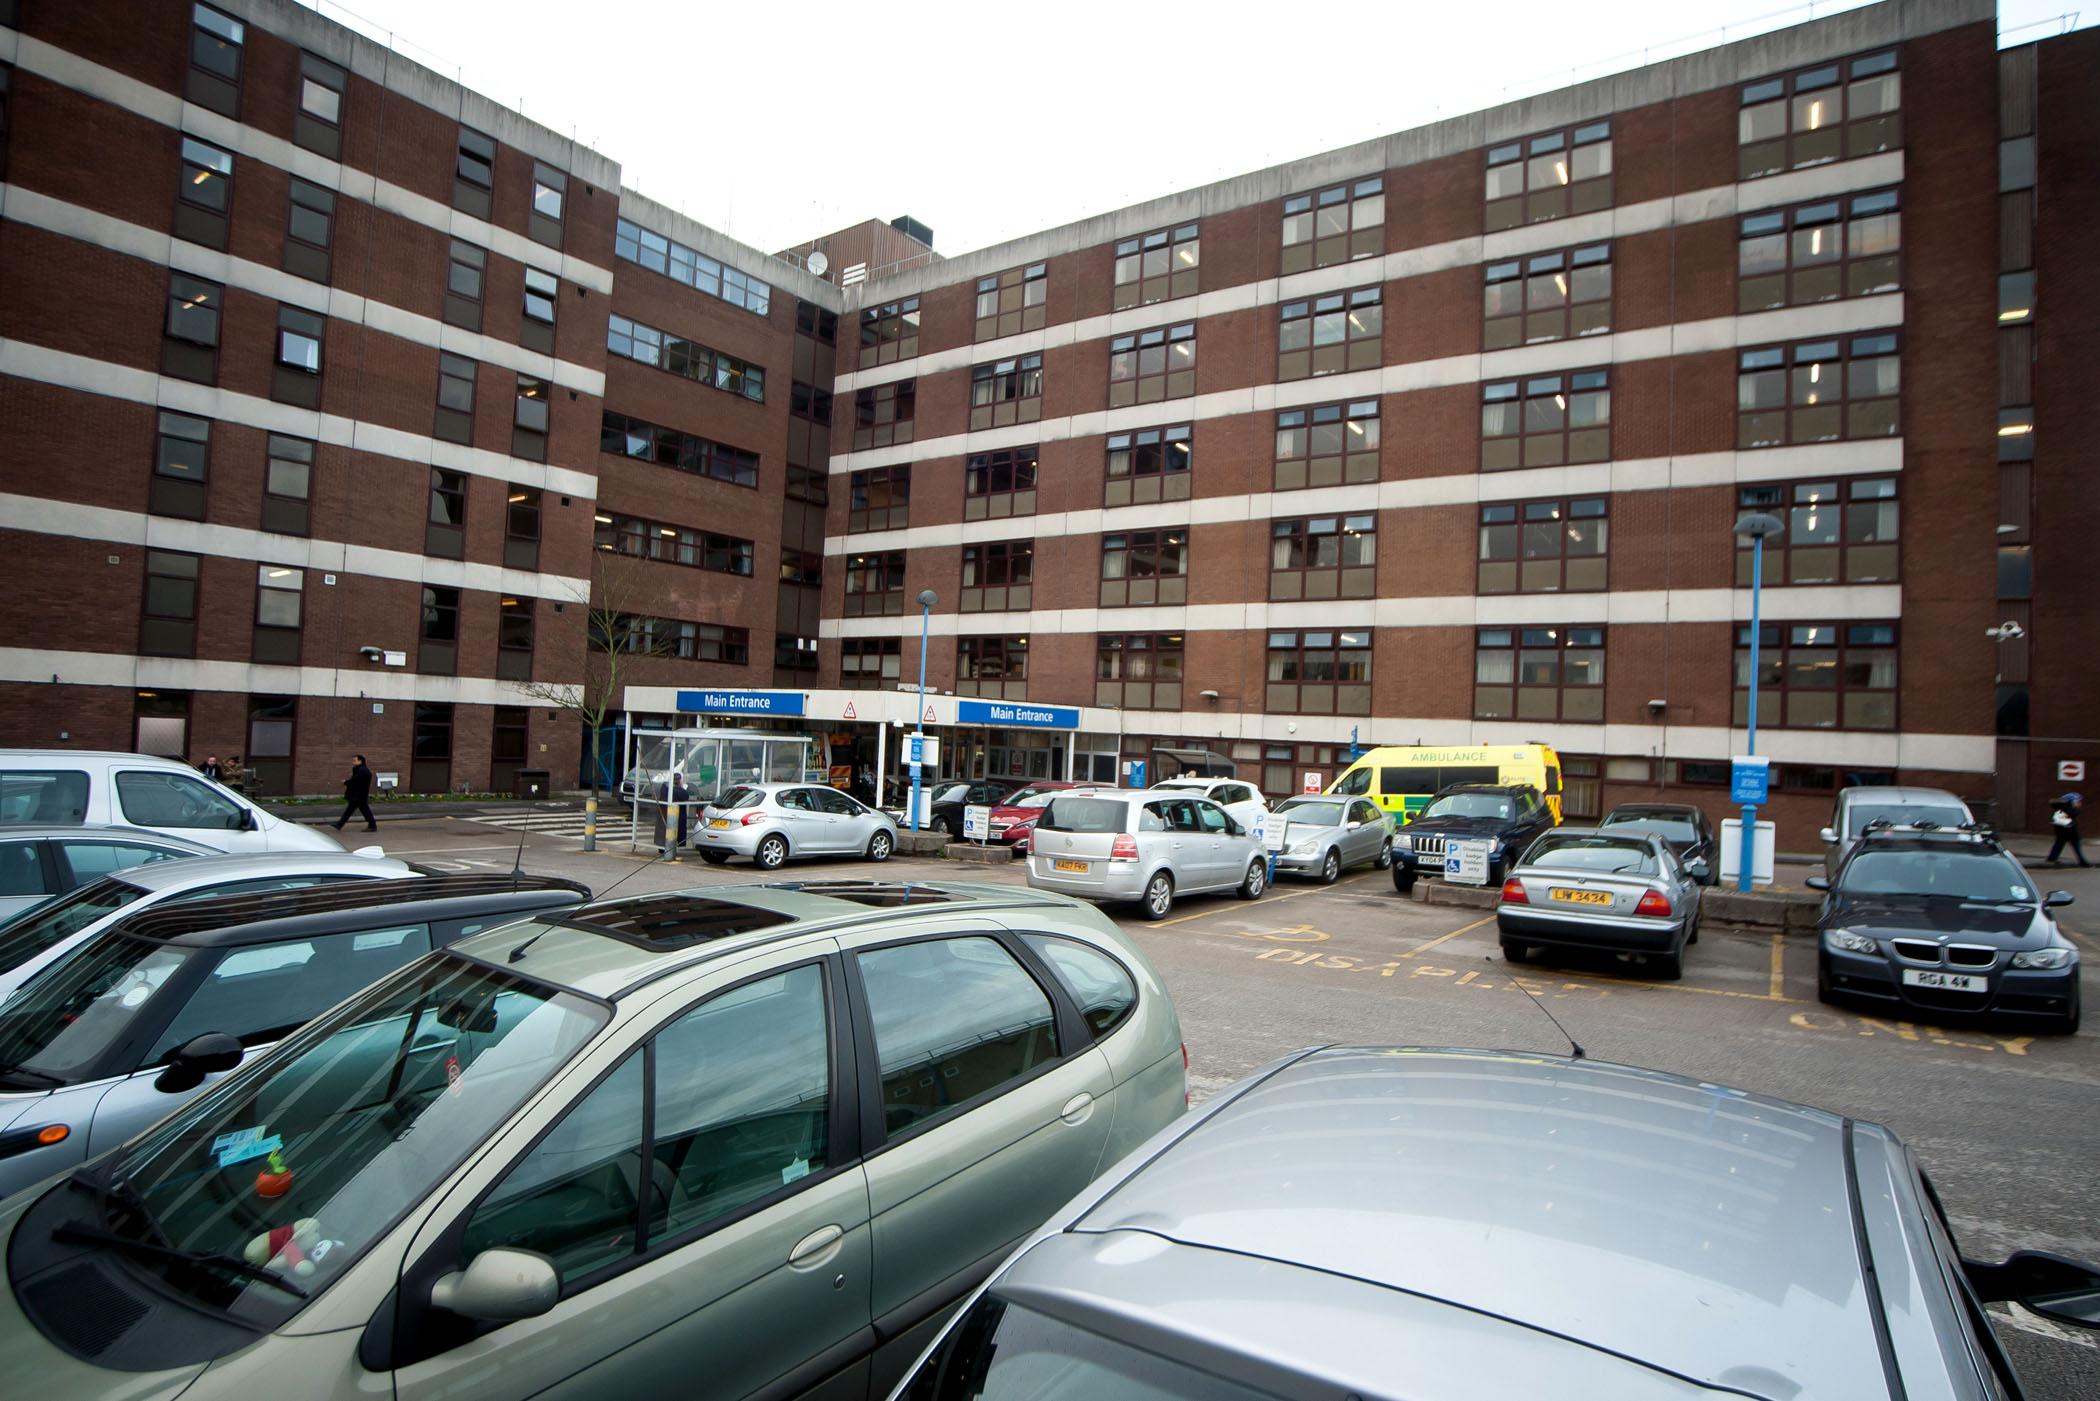 Nhs Trust Resolves Parking Dilemma